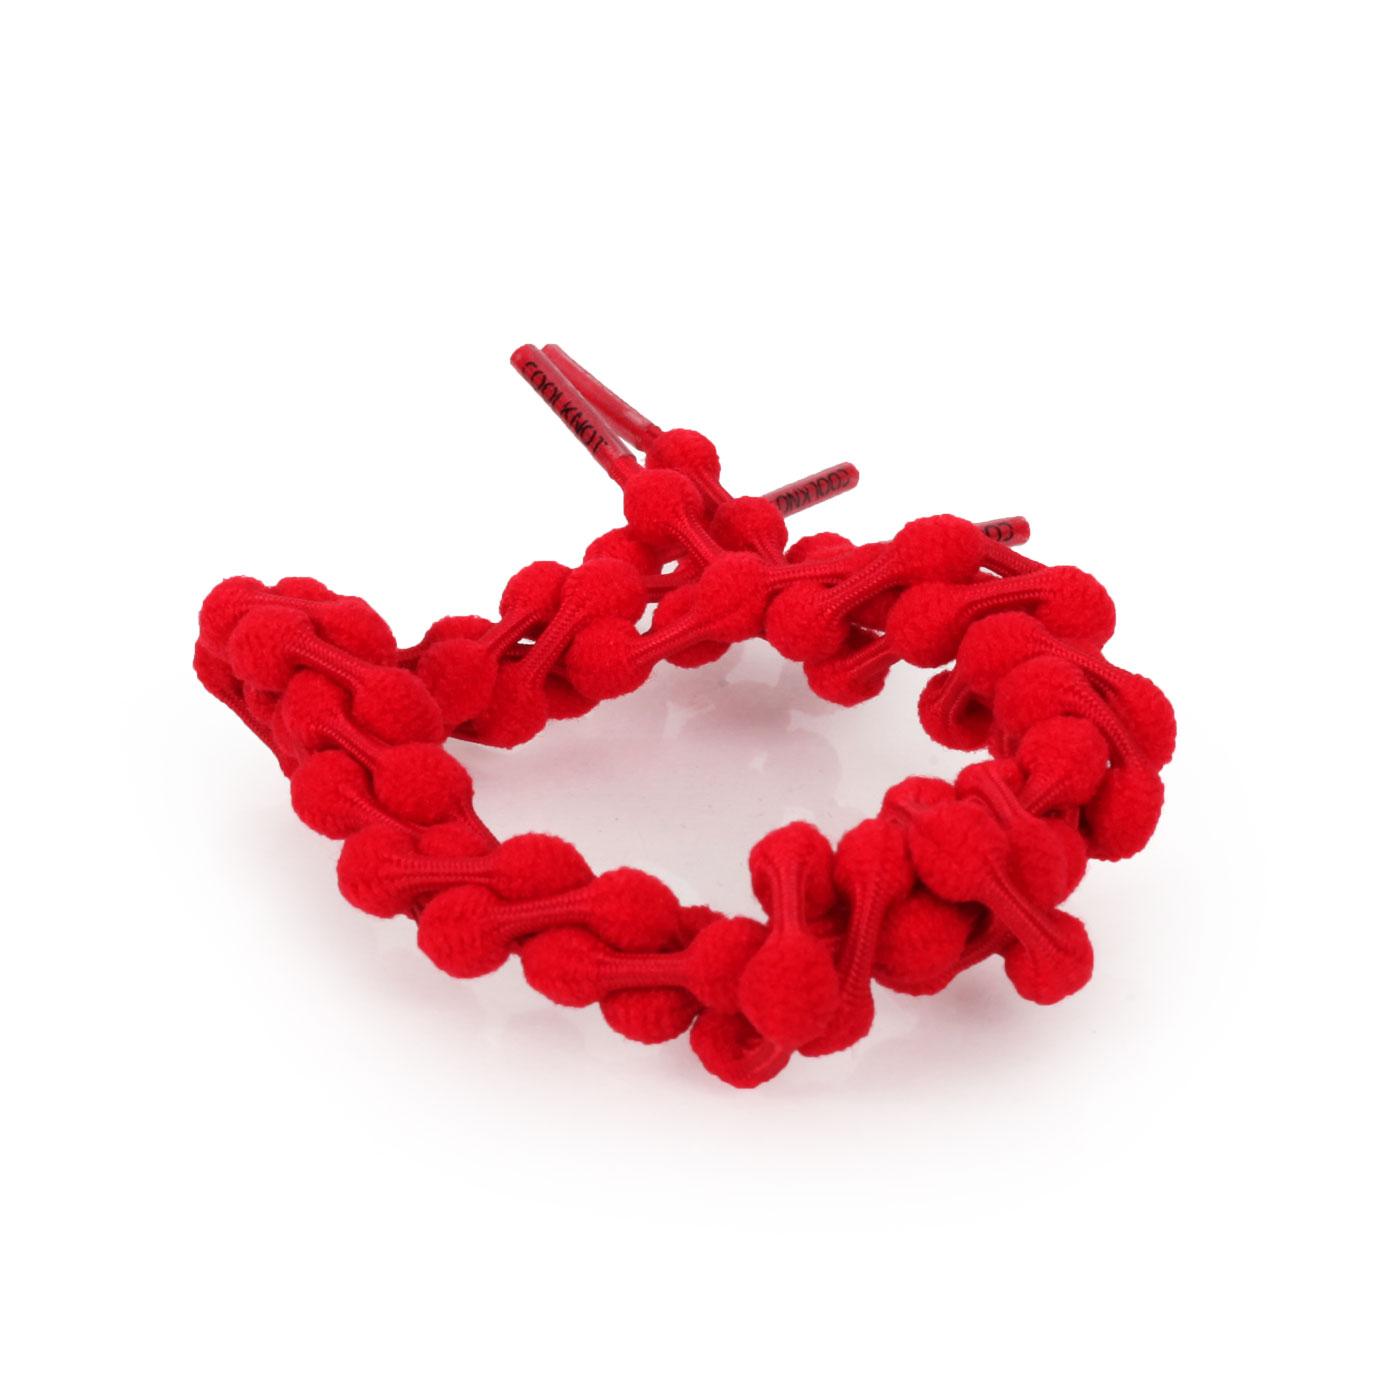 COOLKNOT 豆豆鞋帶(舒適款)60CM 6026201 - 紅